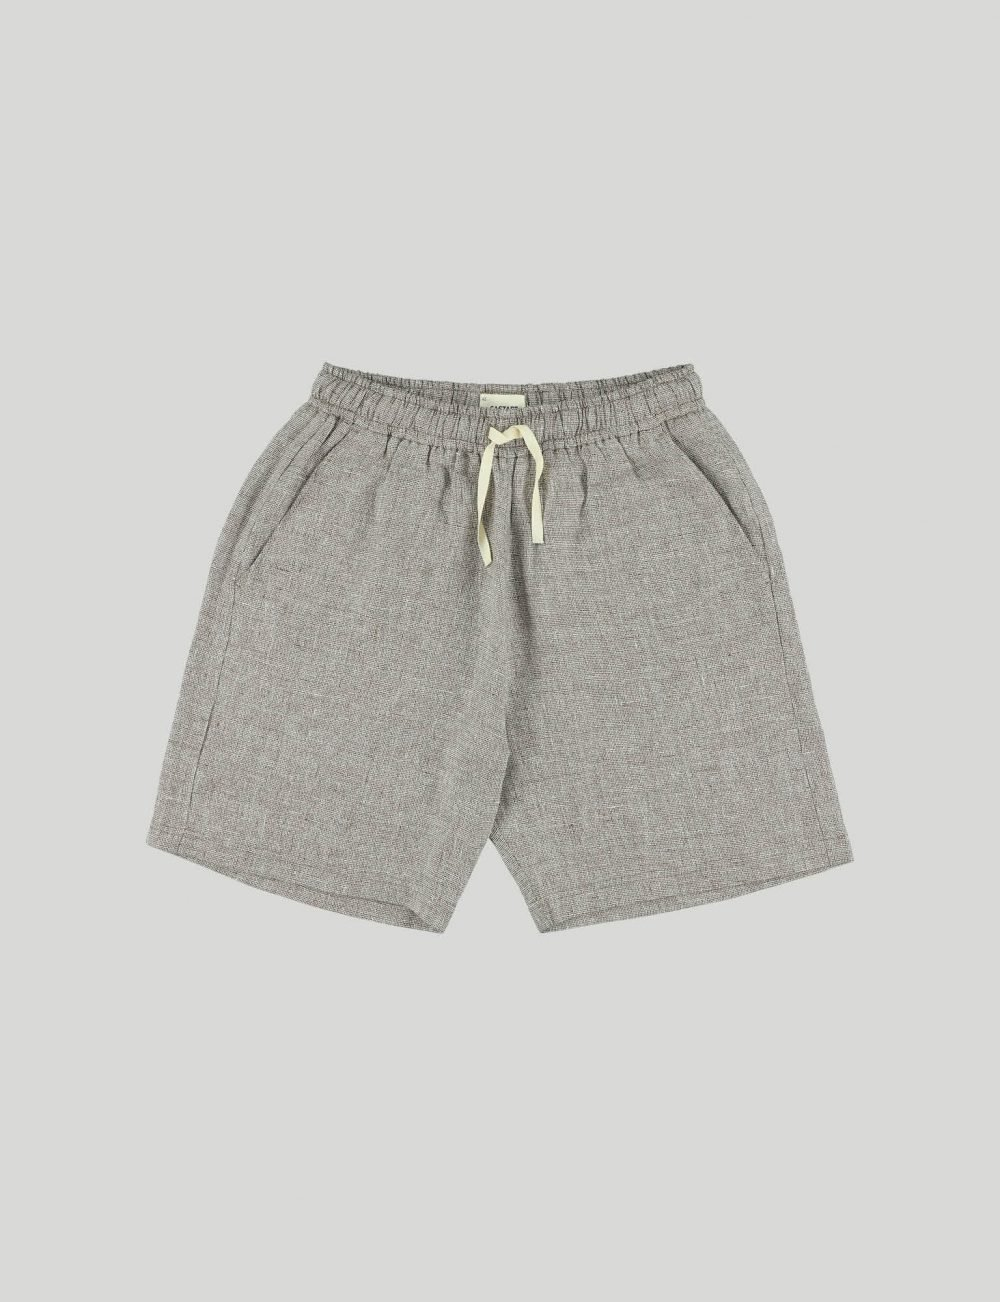 Castart - Devil's Head shorts - Brown